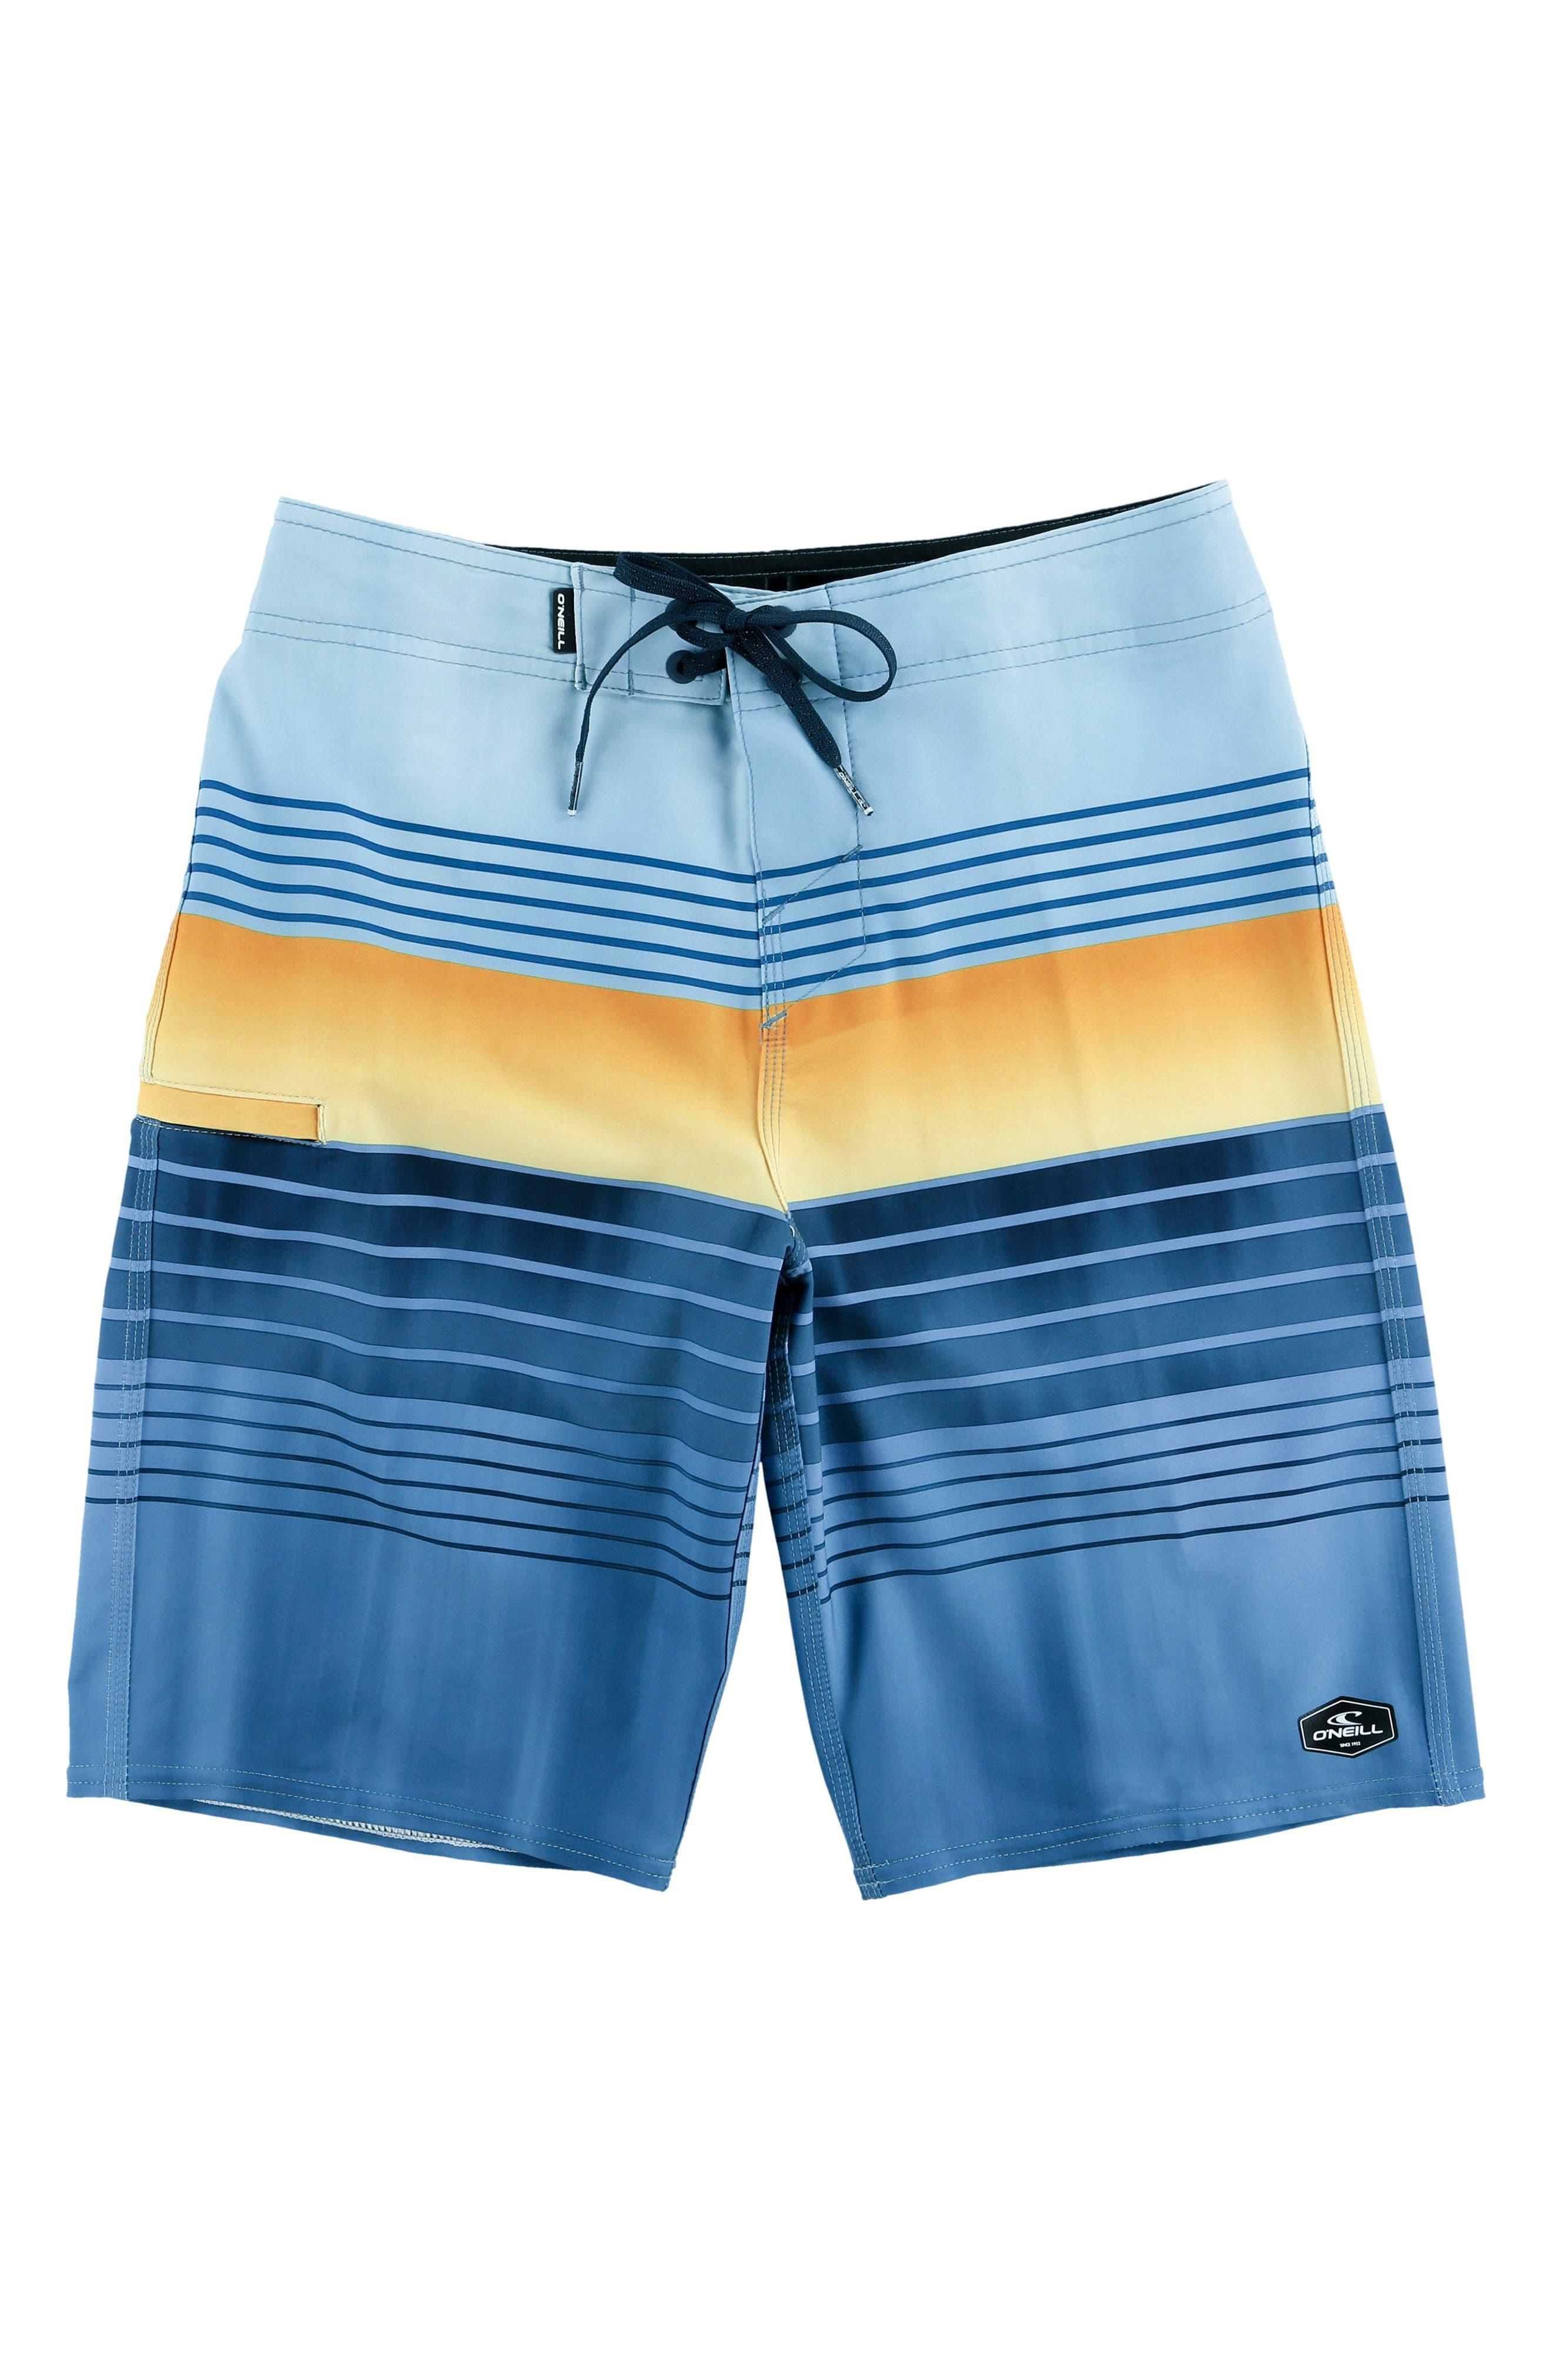 Hyperfreak Heist Board Shorts,                             Main thumbnail 1, color,                             Harbor Blue